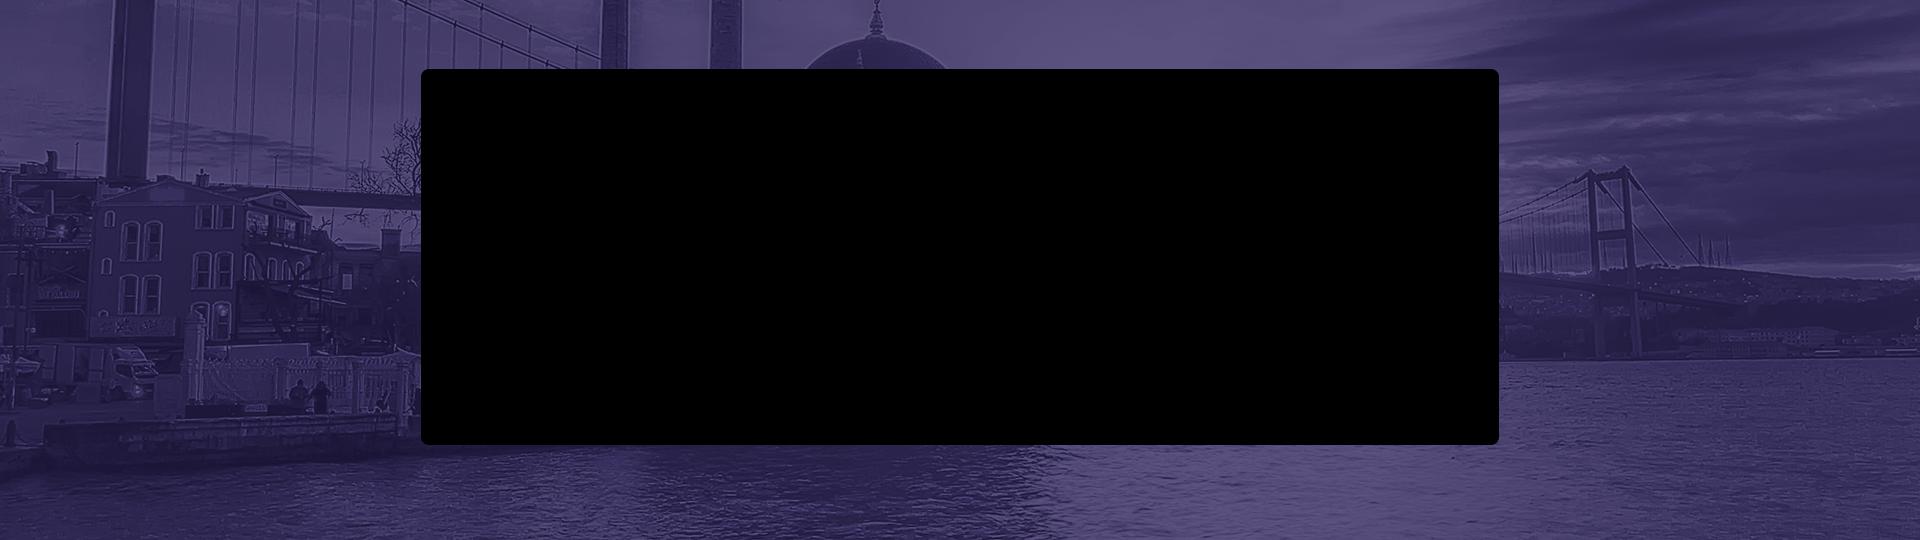 CATEGORY-TV-TLCDUNYADEVILANSMAN-BP-01-10